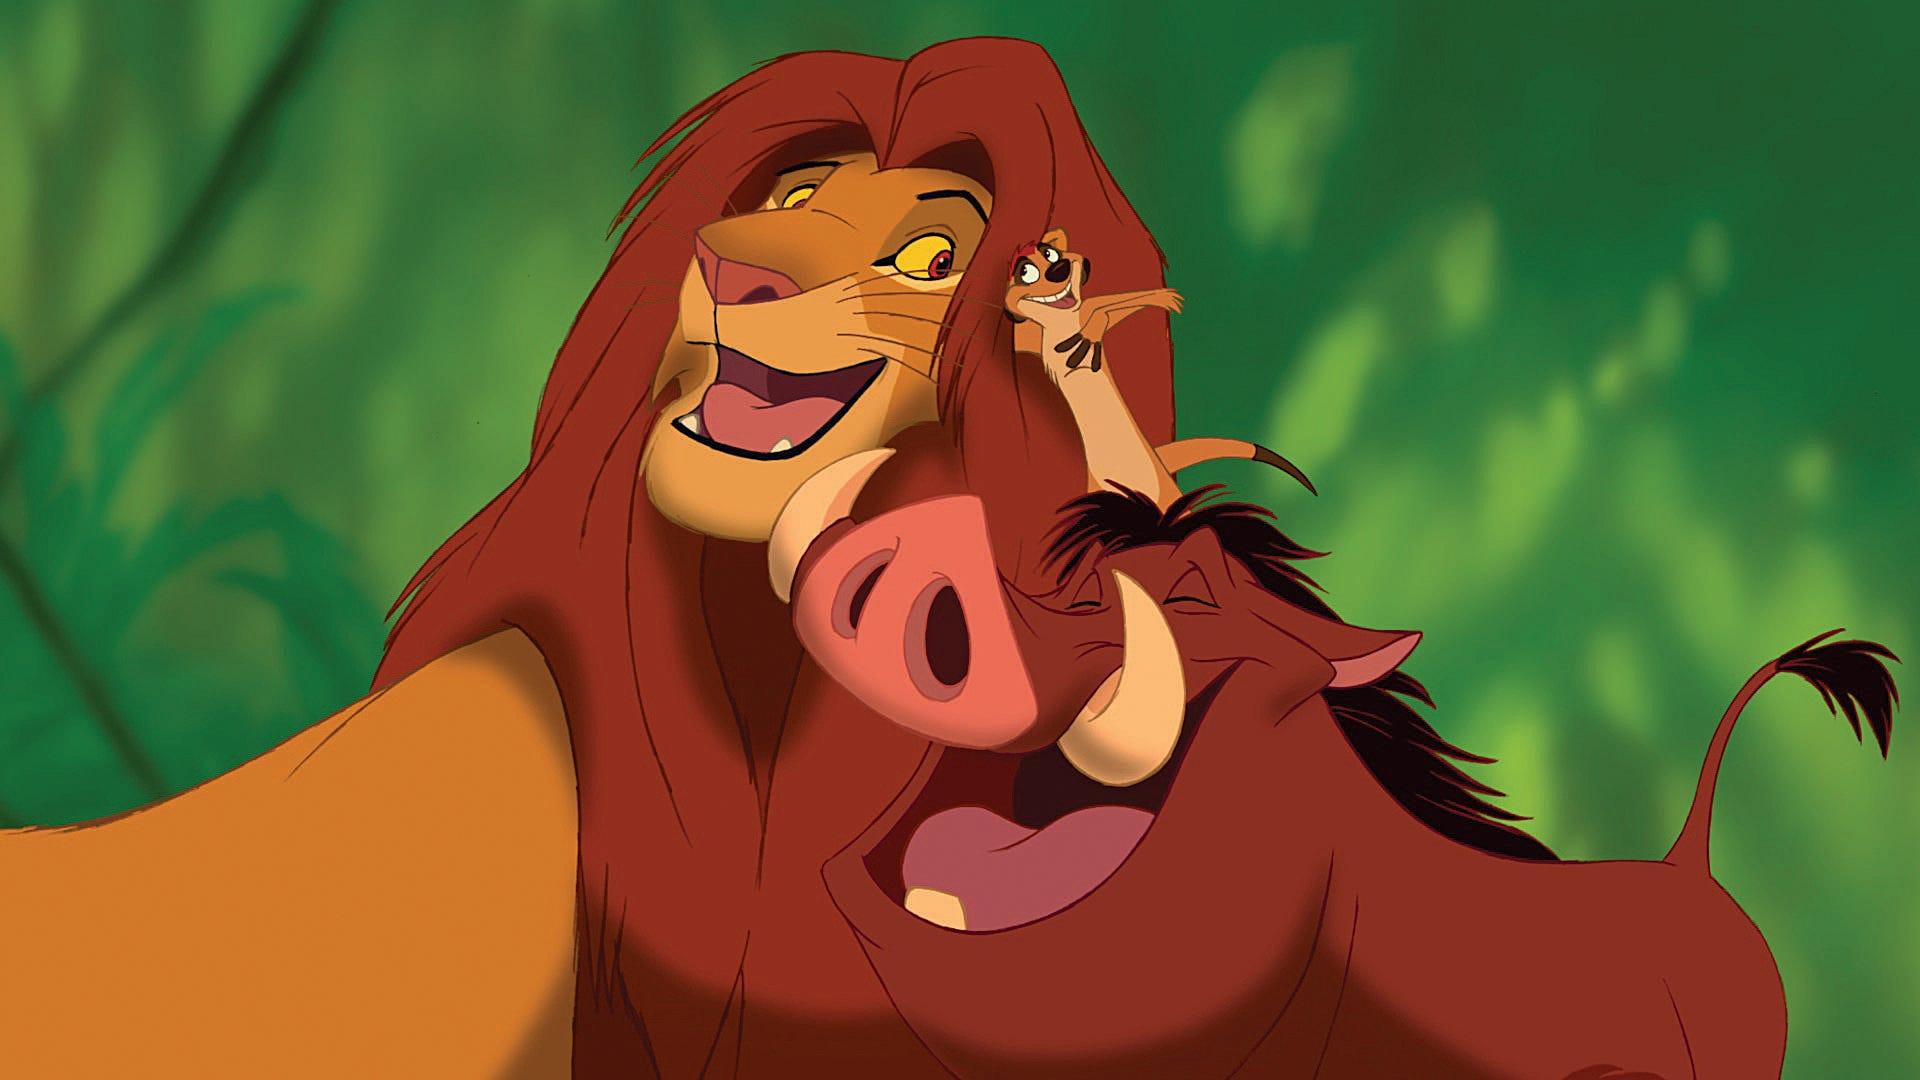 Disney S Animated The Lion King Turns 25 Musical Back In Appleton